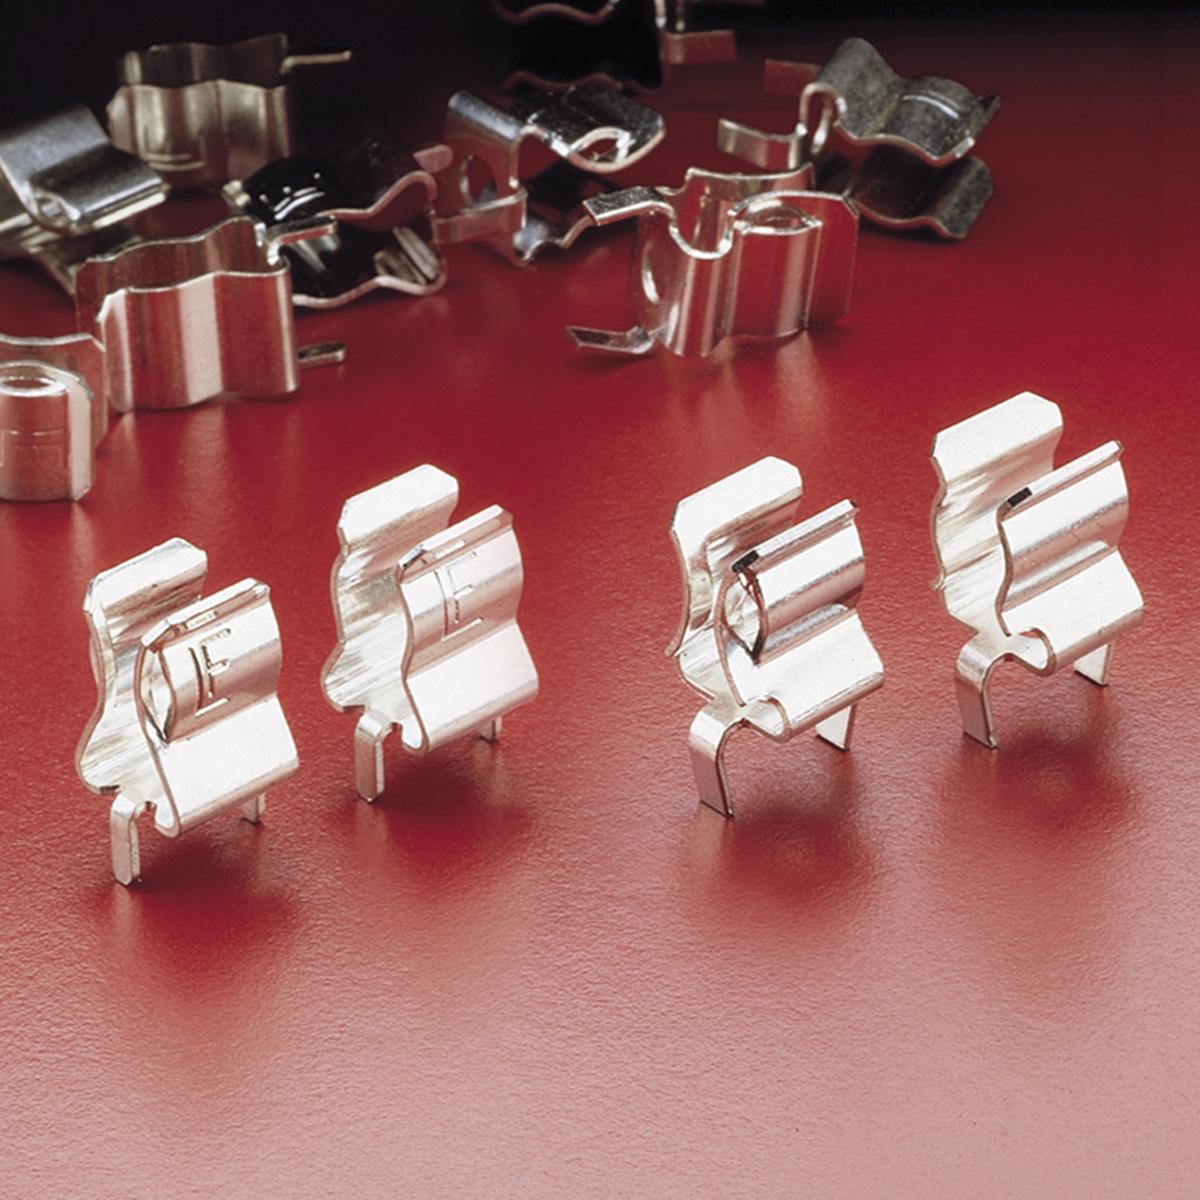 fuse box clips automotive fuse box clips